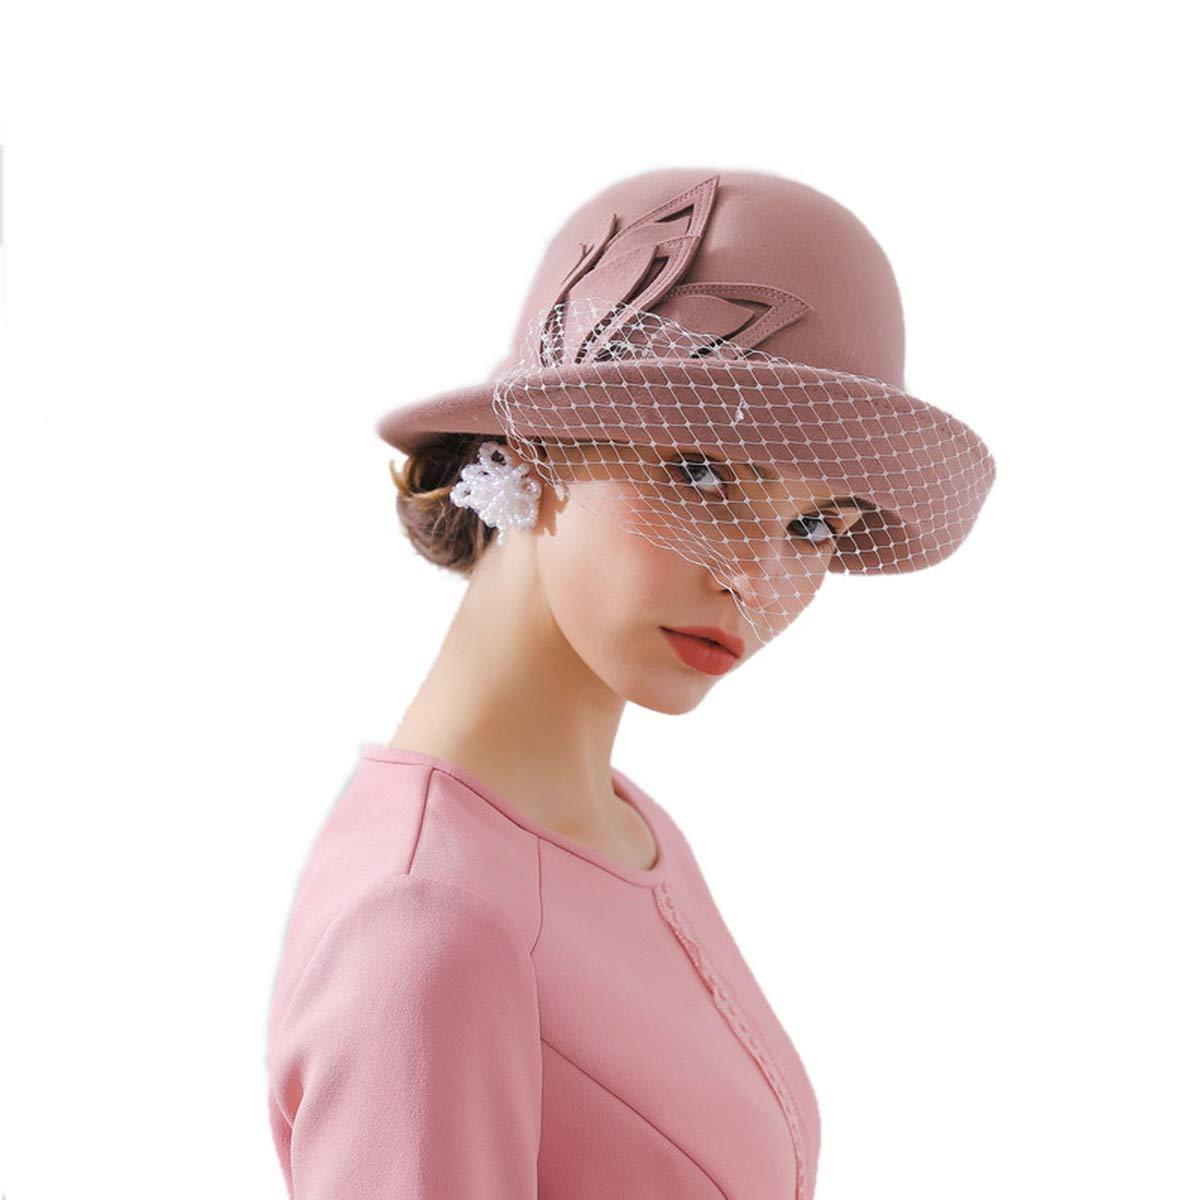 Women's Wool Felt Cloche Hats Wide Brim Basin Cap Ladies Derby Cloche Hat with Fancinator Autumn Winter FW023073-Black